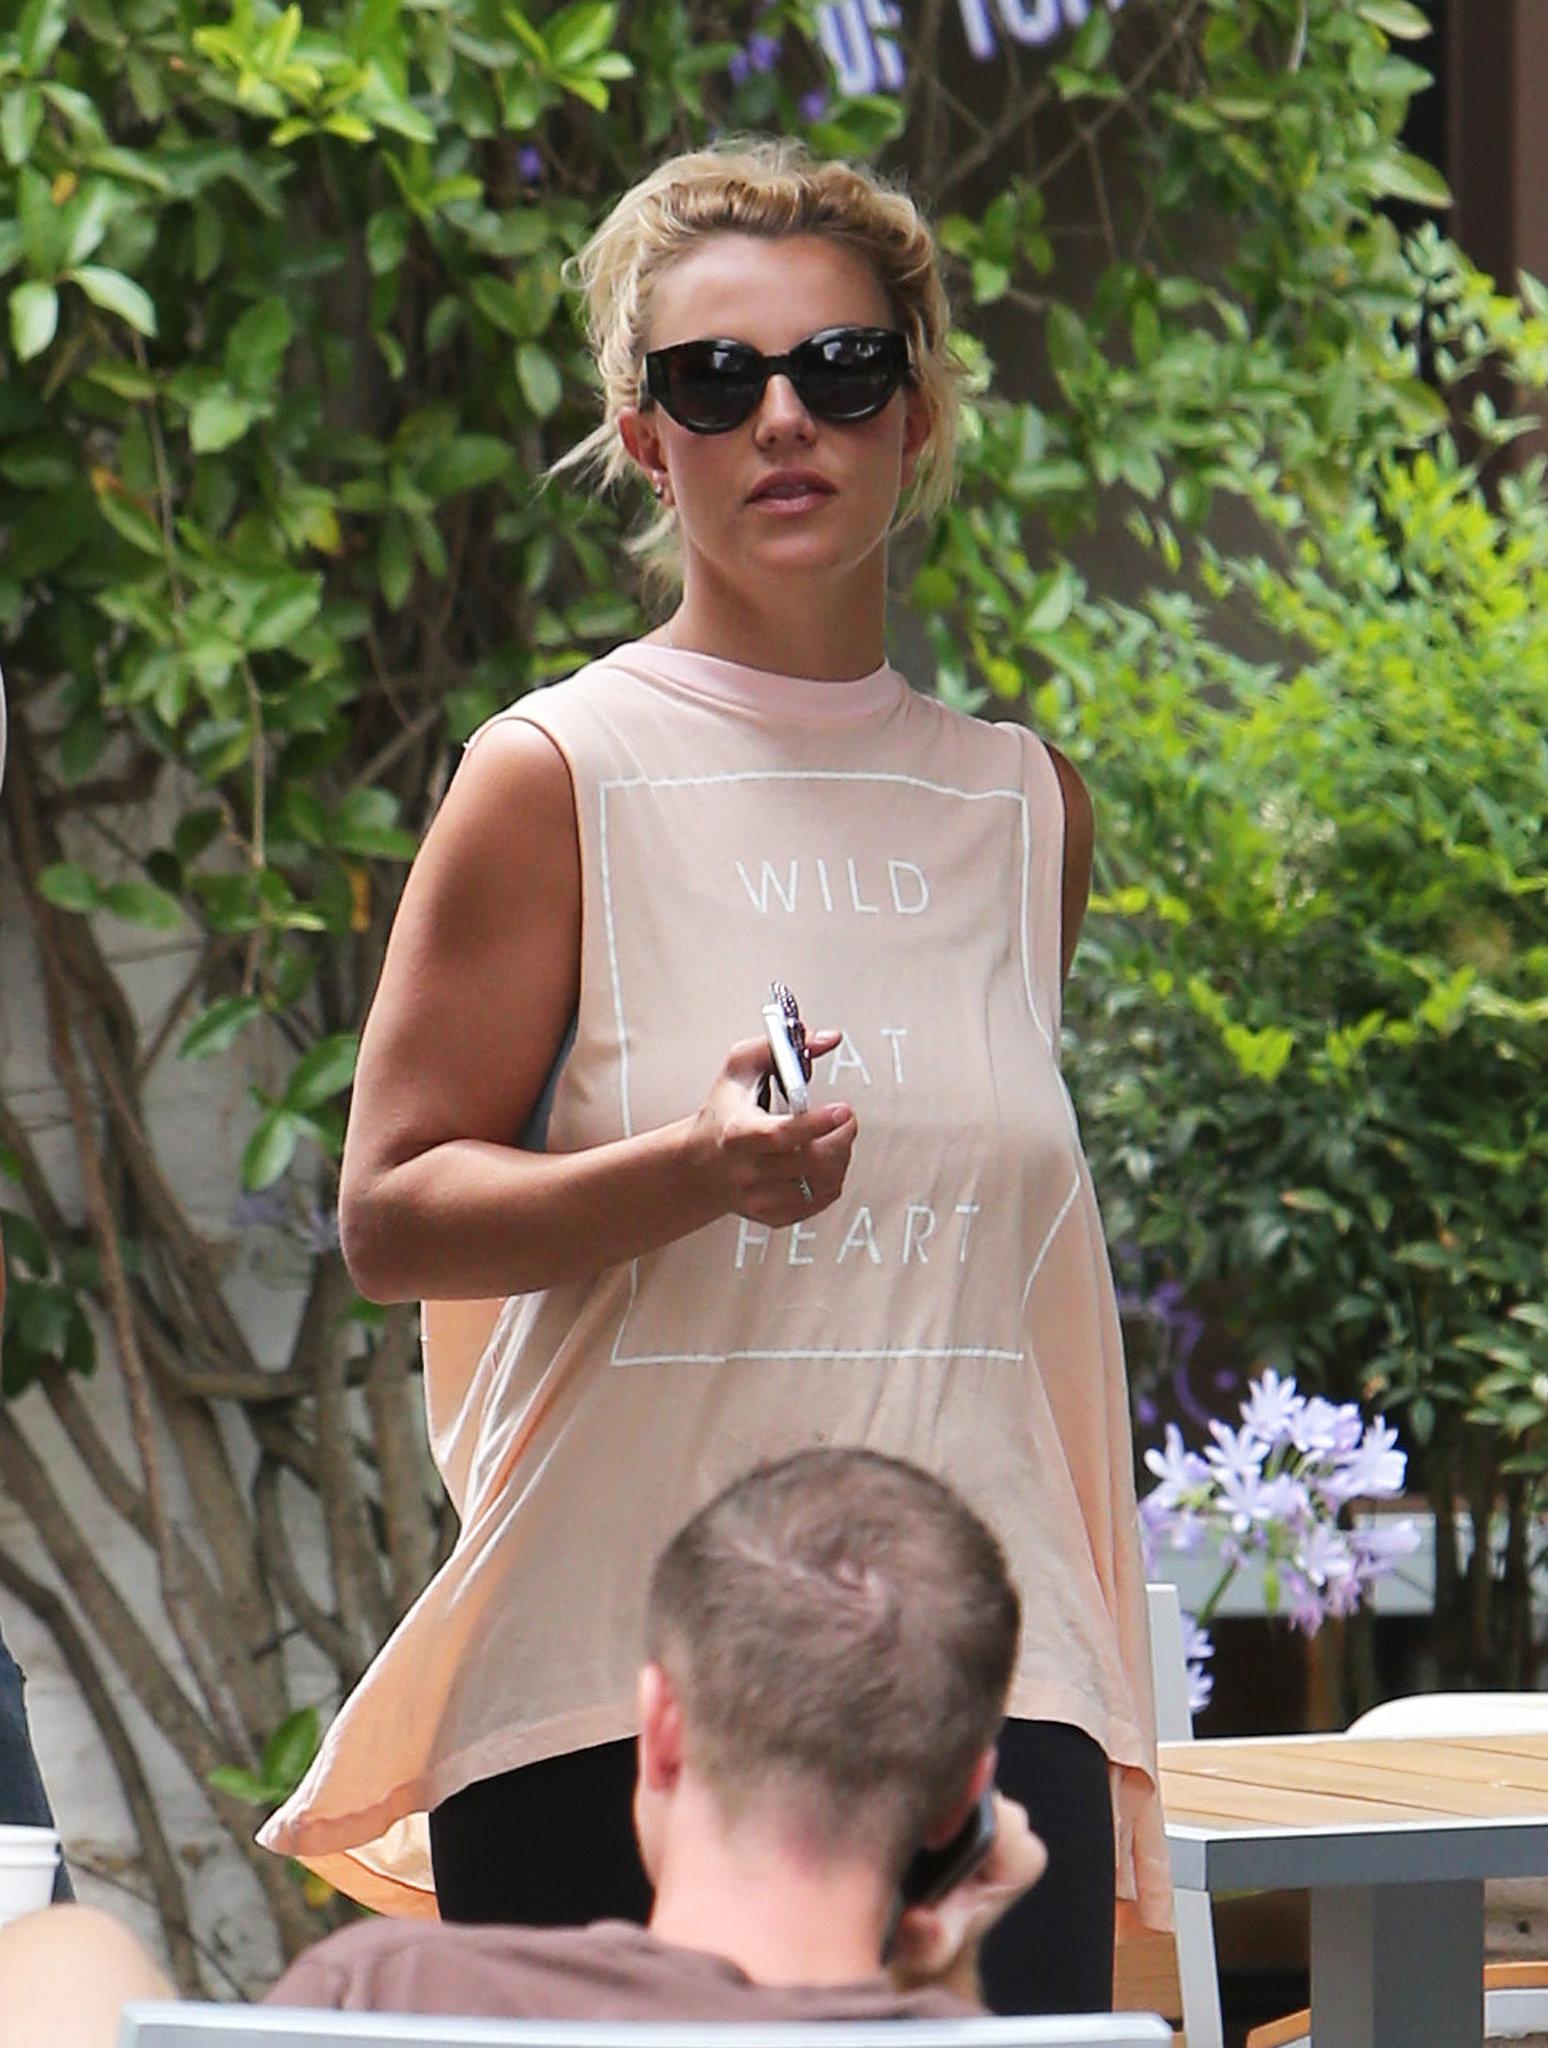 Britney Spears Flaunts Her Wild Heart